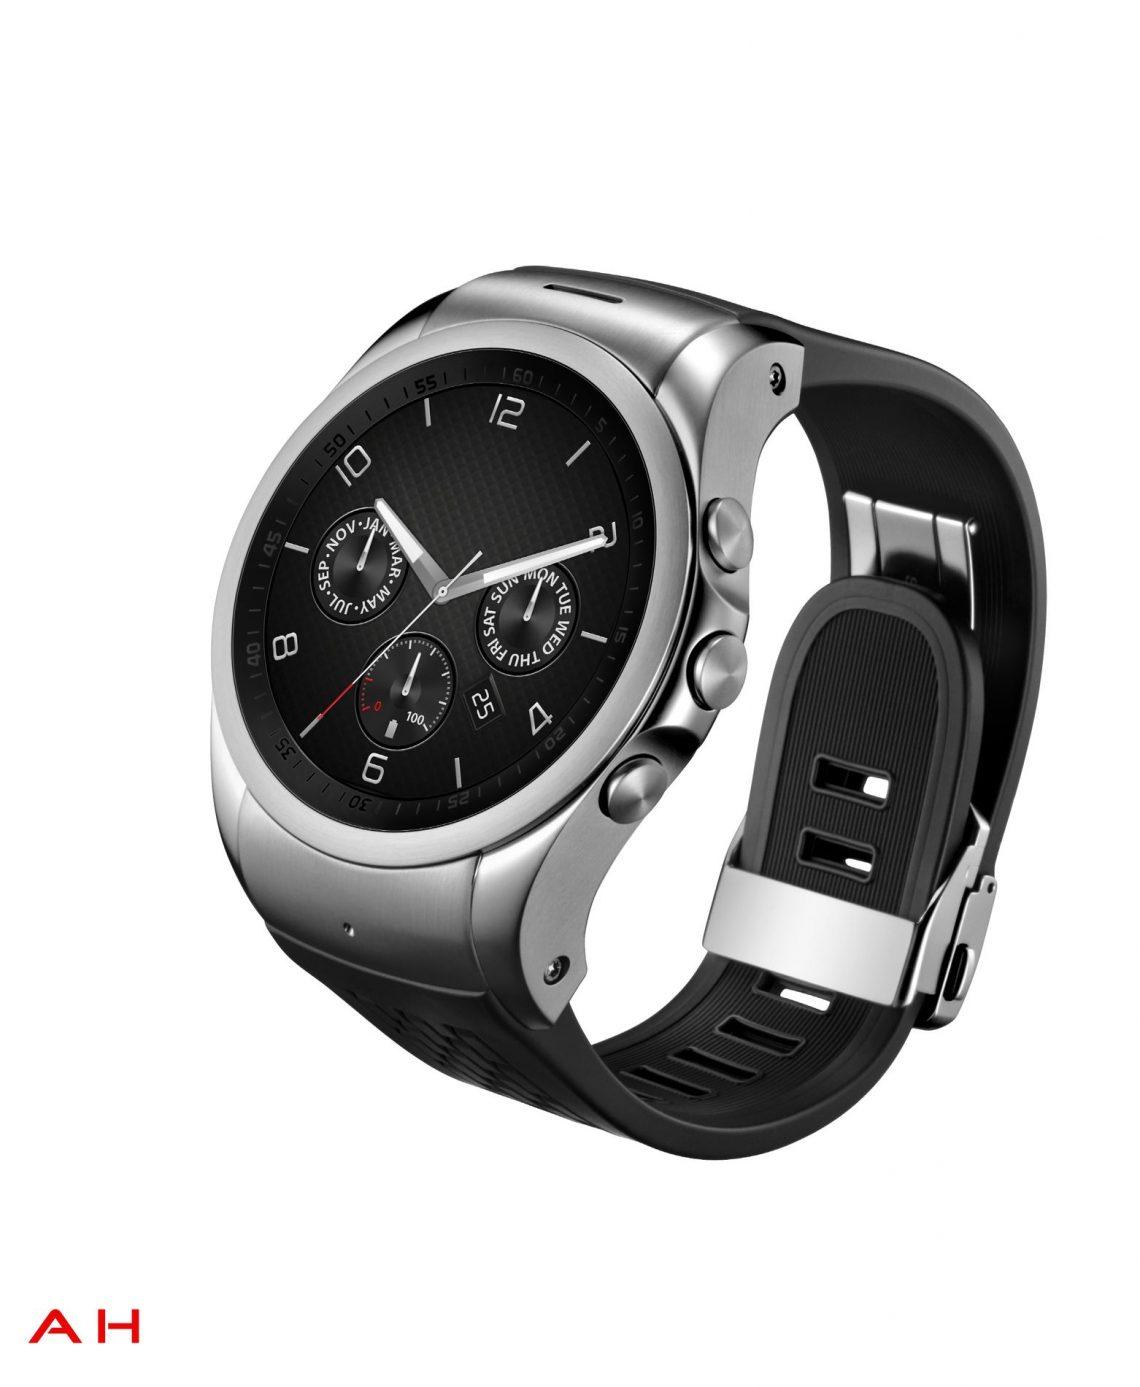 LG เปิดตัว LG Watch Urbane LTE ออกมาล้ม Samsung Gear S โดยเฉพาะ